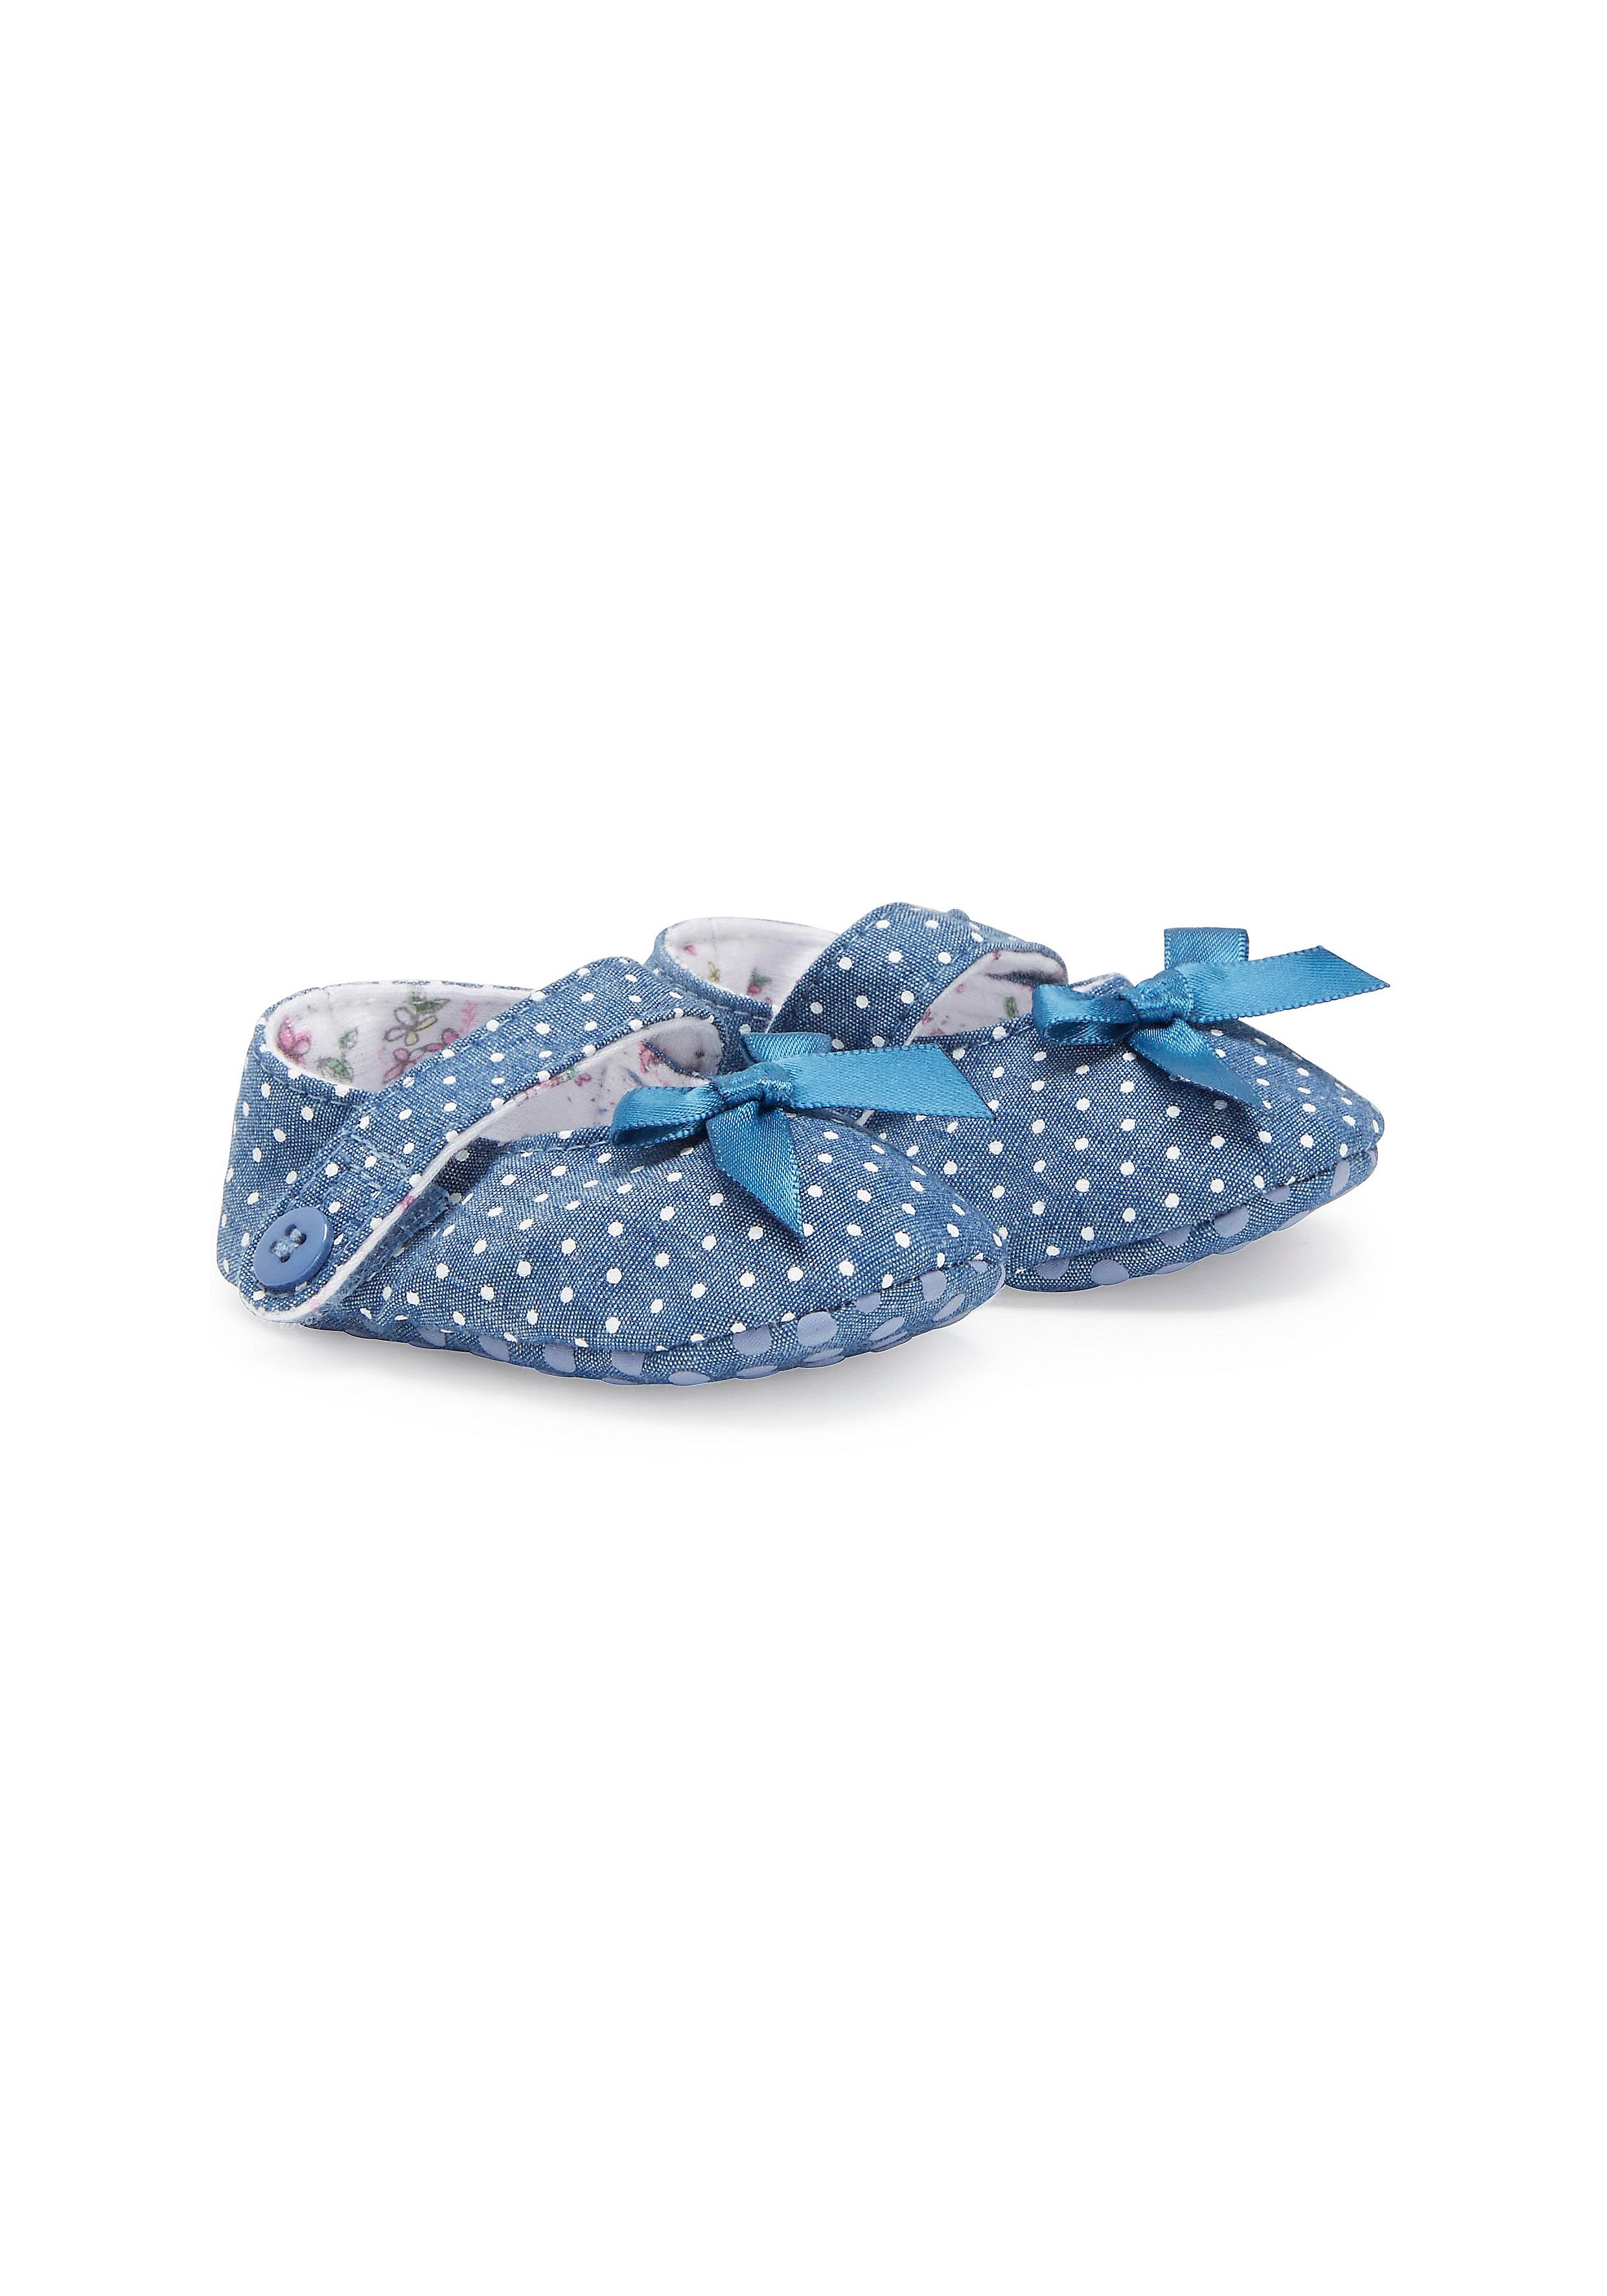 Mothercare | Girls Spotty Booties - Denim